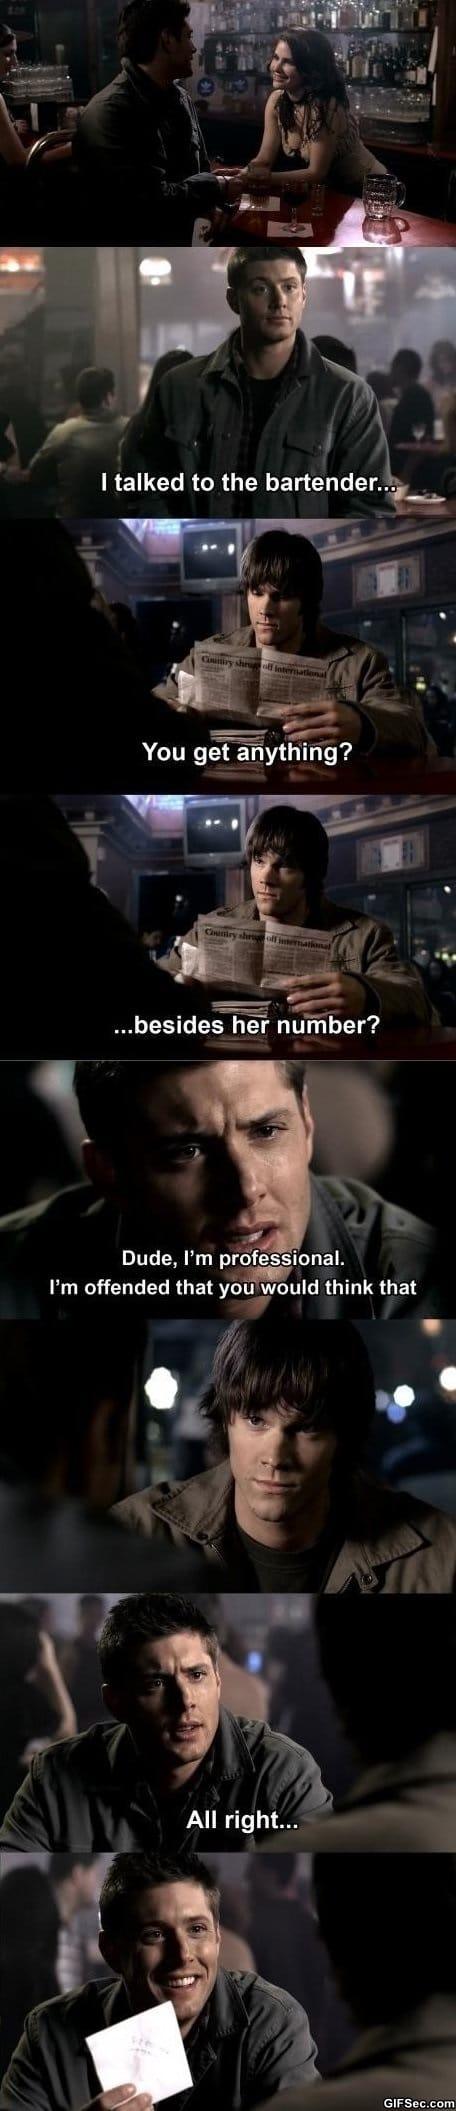 Funny - Dean Winchester